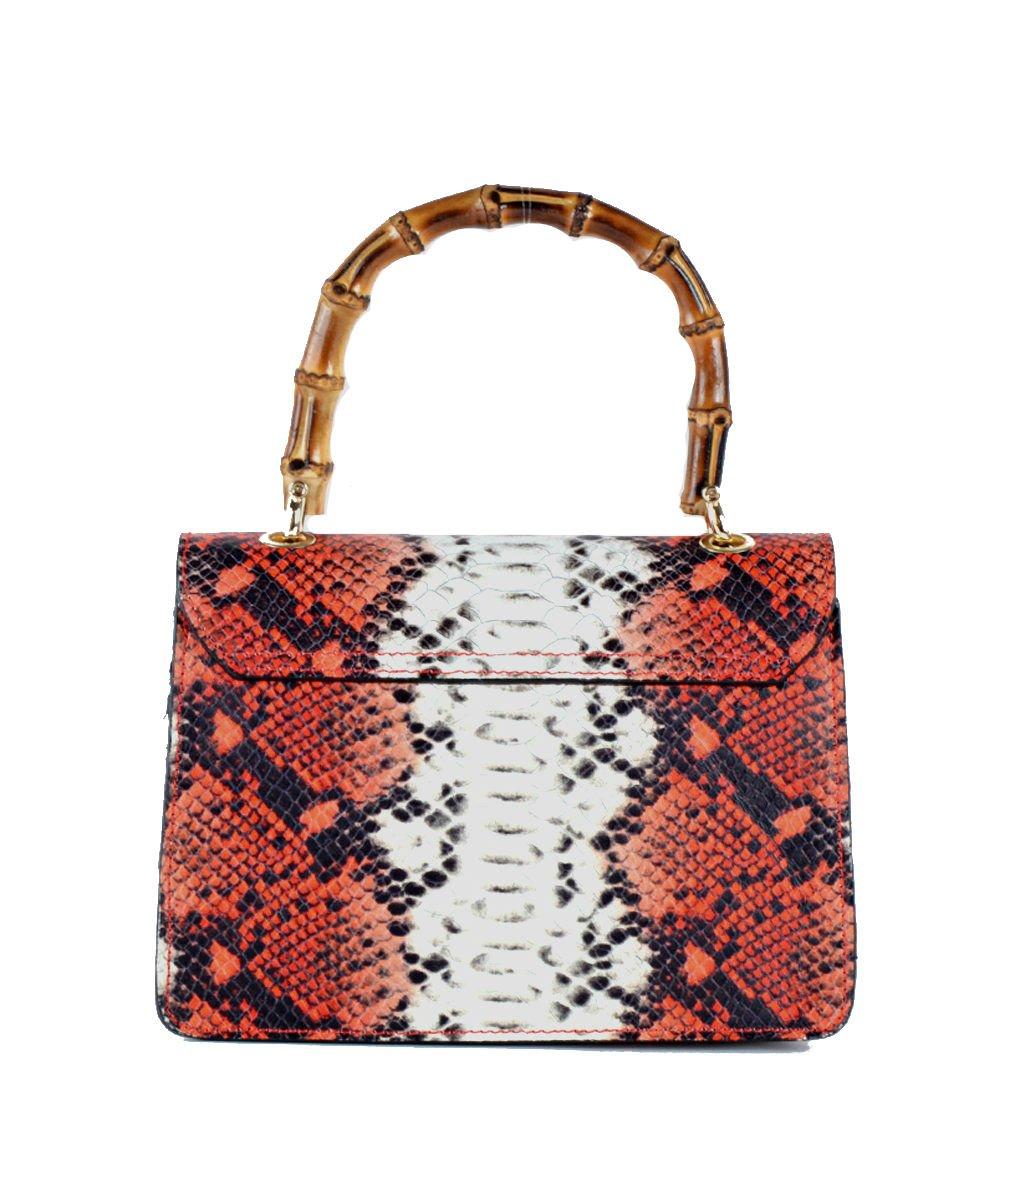 8a6803e1e6b Leren-Handtas-Lovely-Wood-Snake-rood rode slangenprint dames-tassen. Back  to HandtassenSchoudertassenSnakeTrendsTassenLeren Tassen